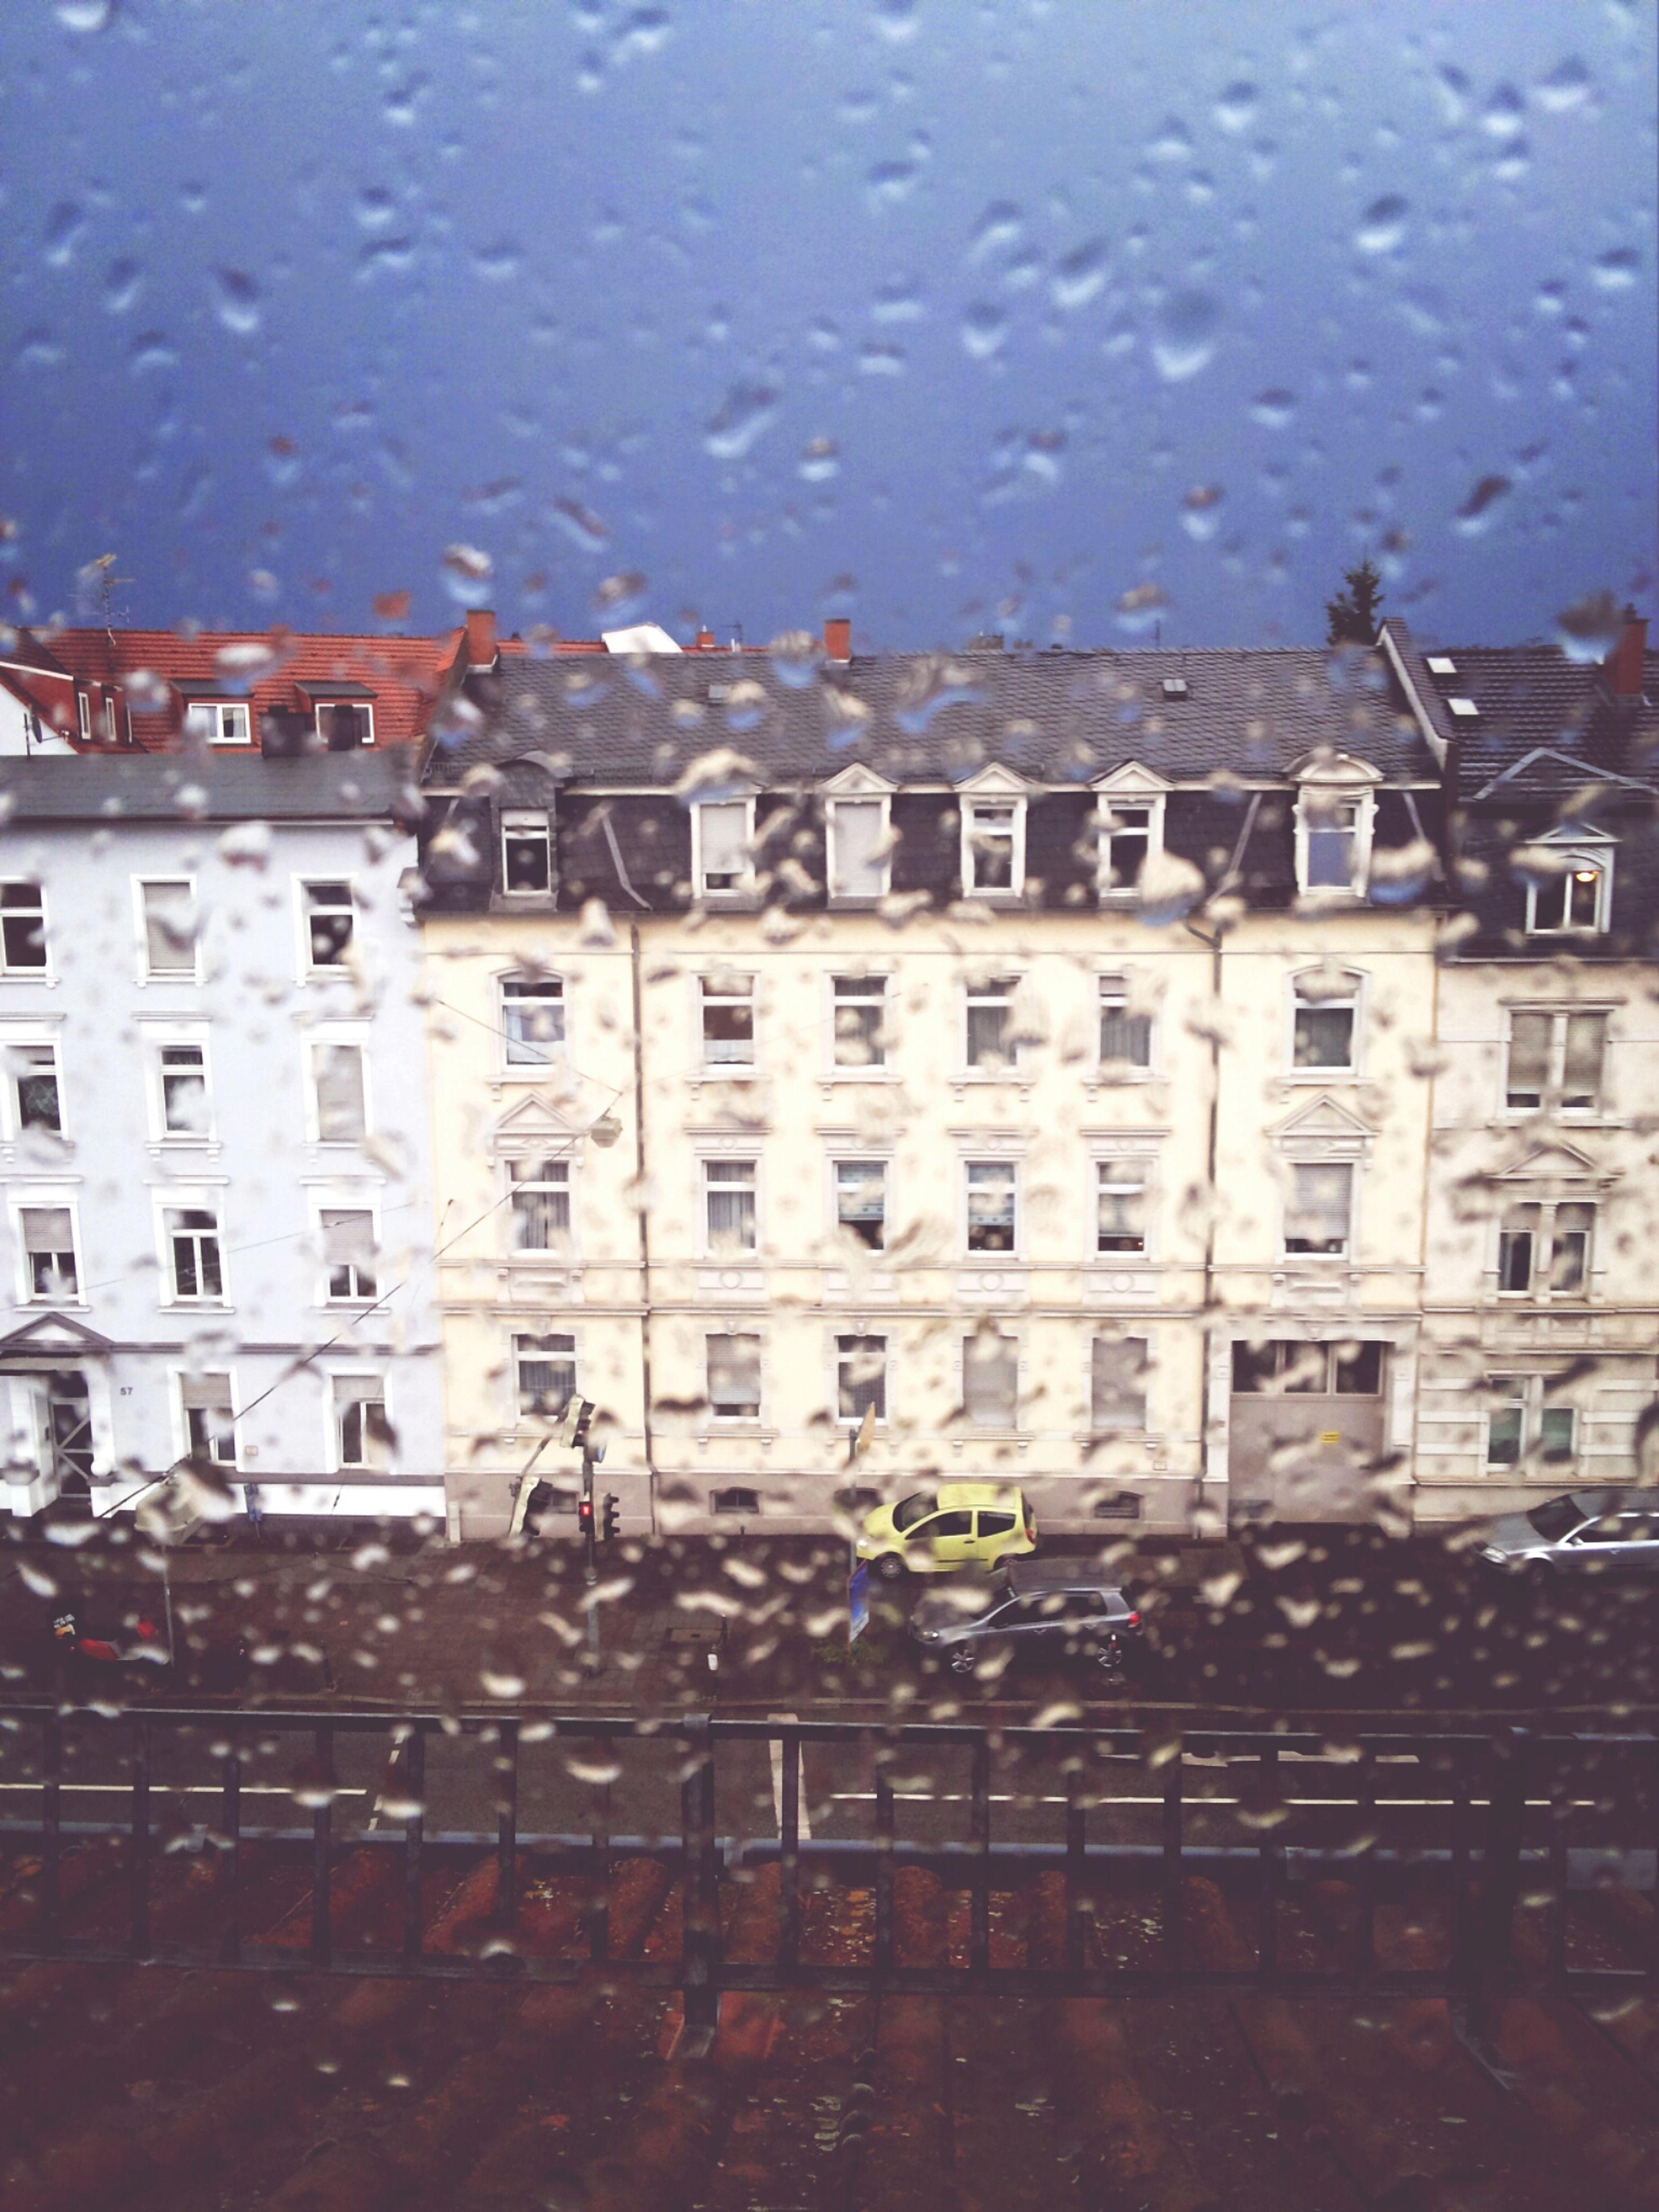 window, building exterior, architecture, built structure, glass - material, wet, sky, transparent, water, rain, drop, city, building, indoors, weather, glass, residential building, dusk, residential structure, season